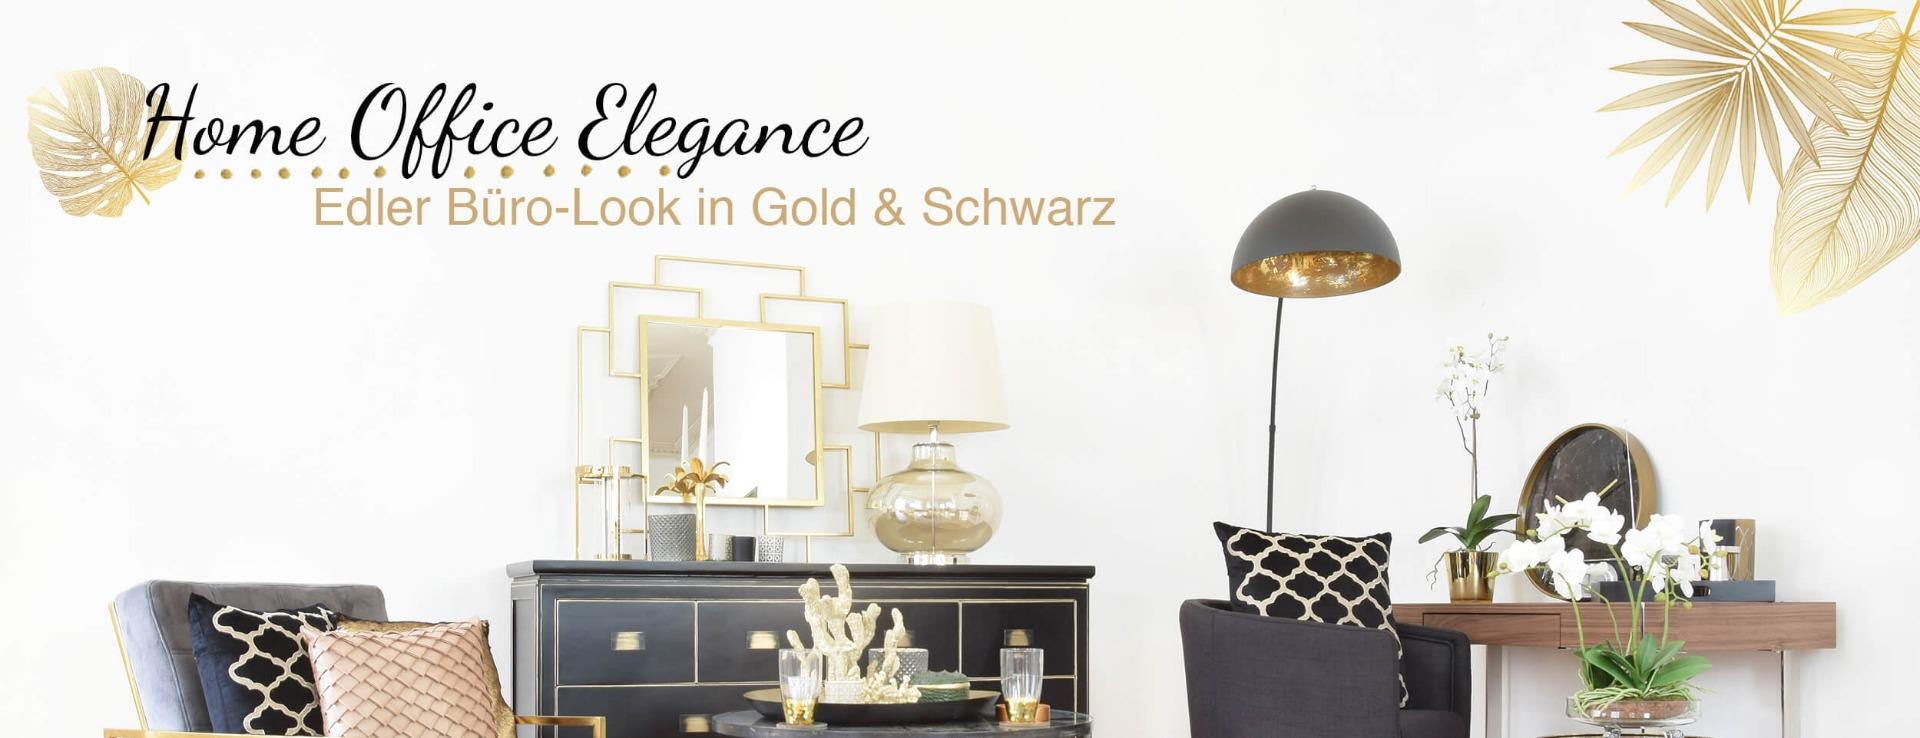 Home Office Elegance Edler Buro Look In Gold Schwarz Looks